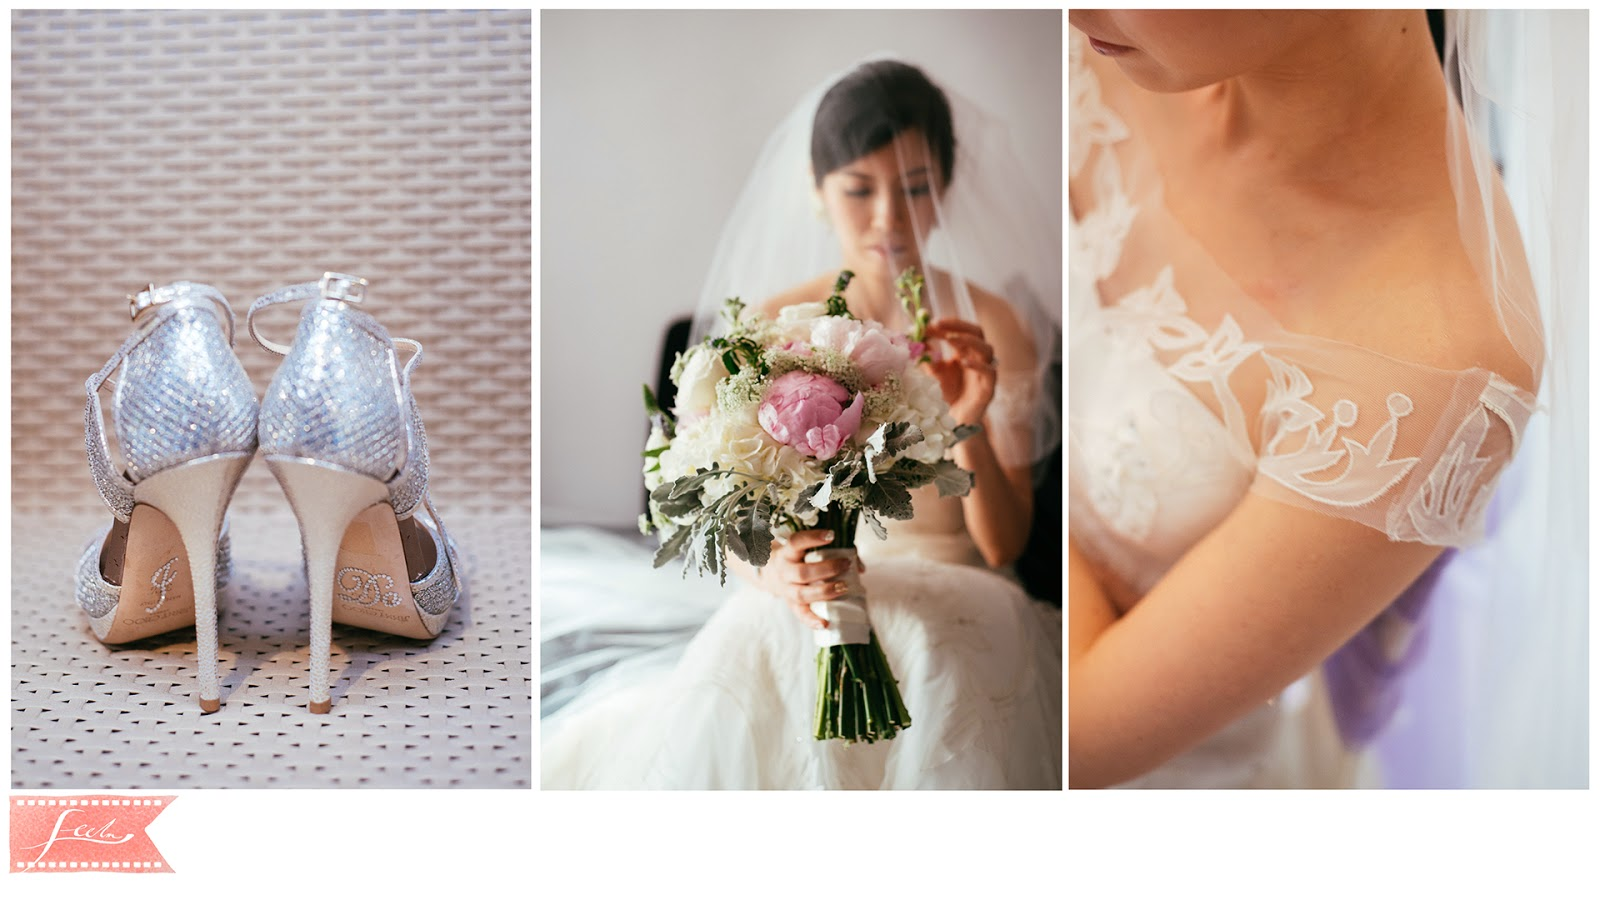 bride getting ready wedding shoes bouquet feelm